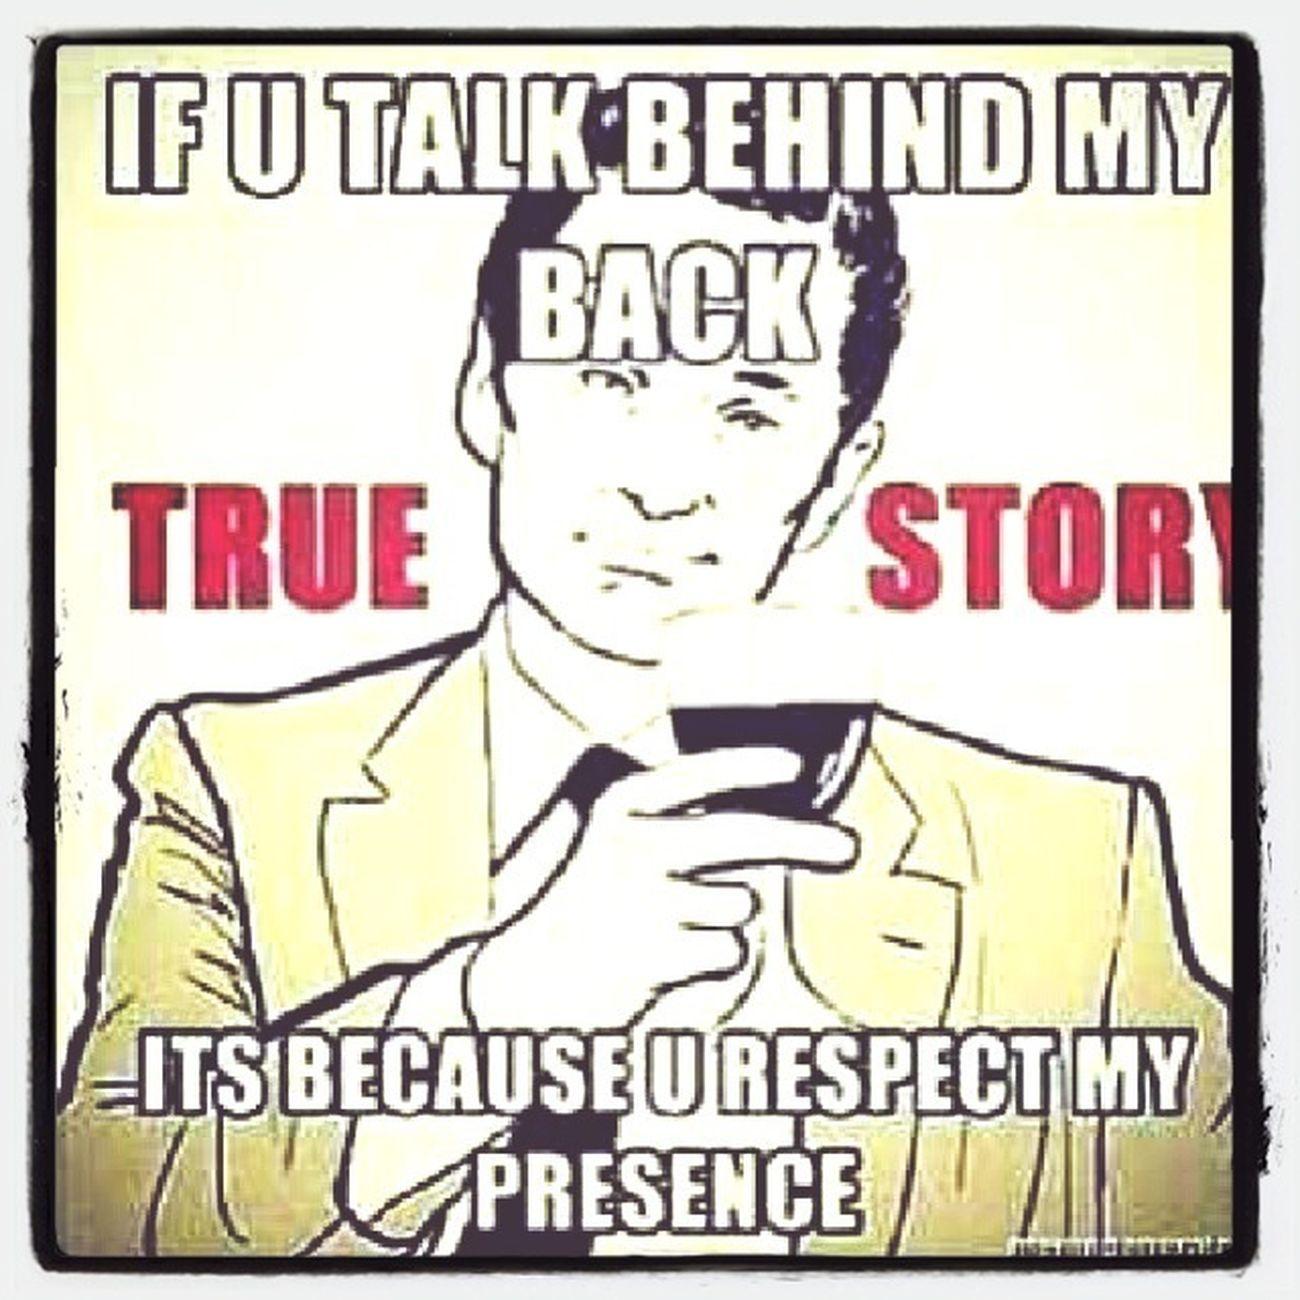 True $tory